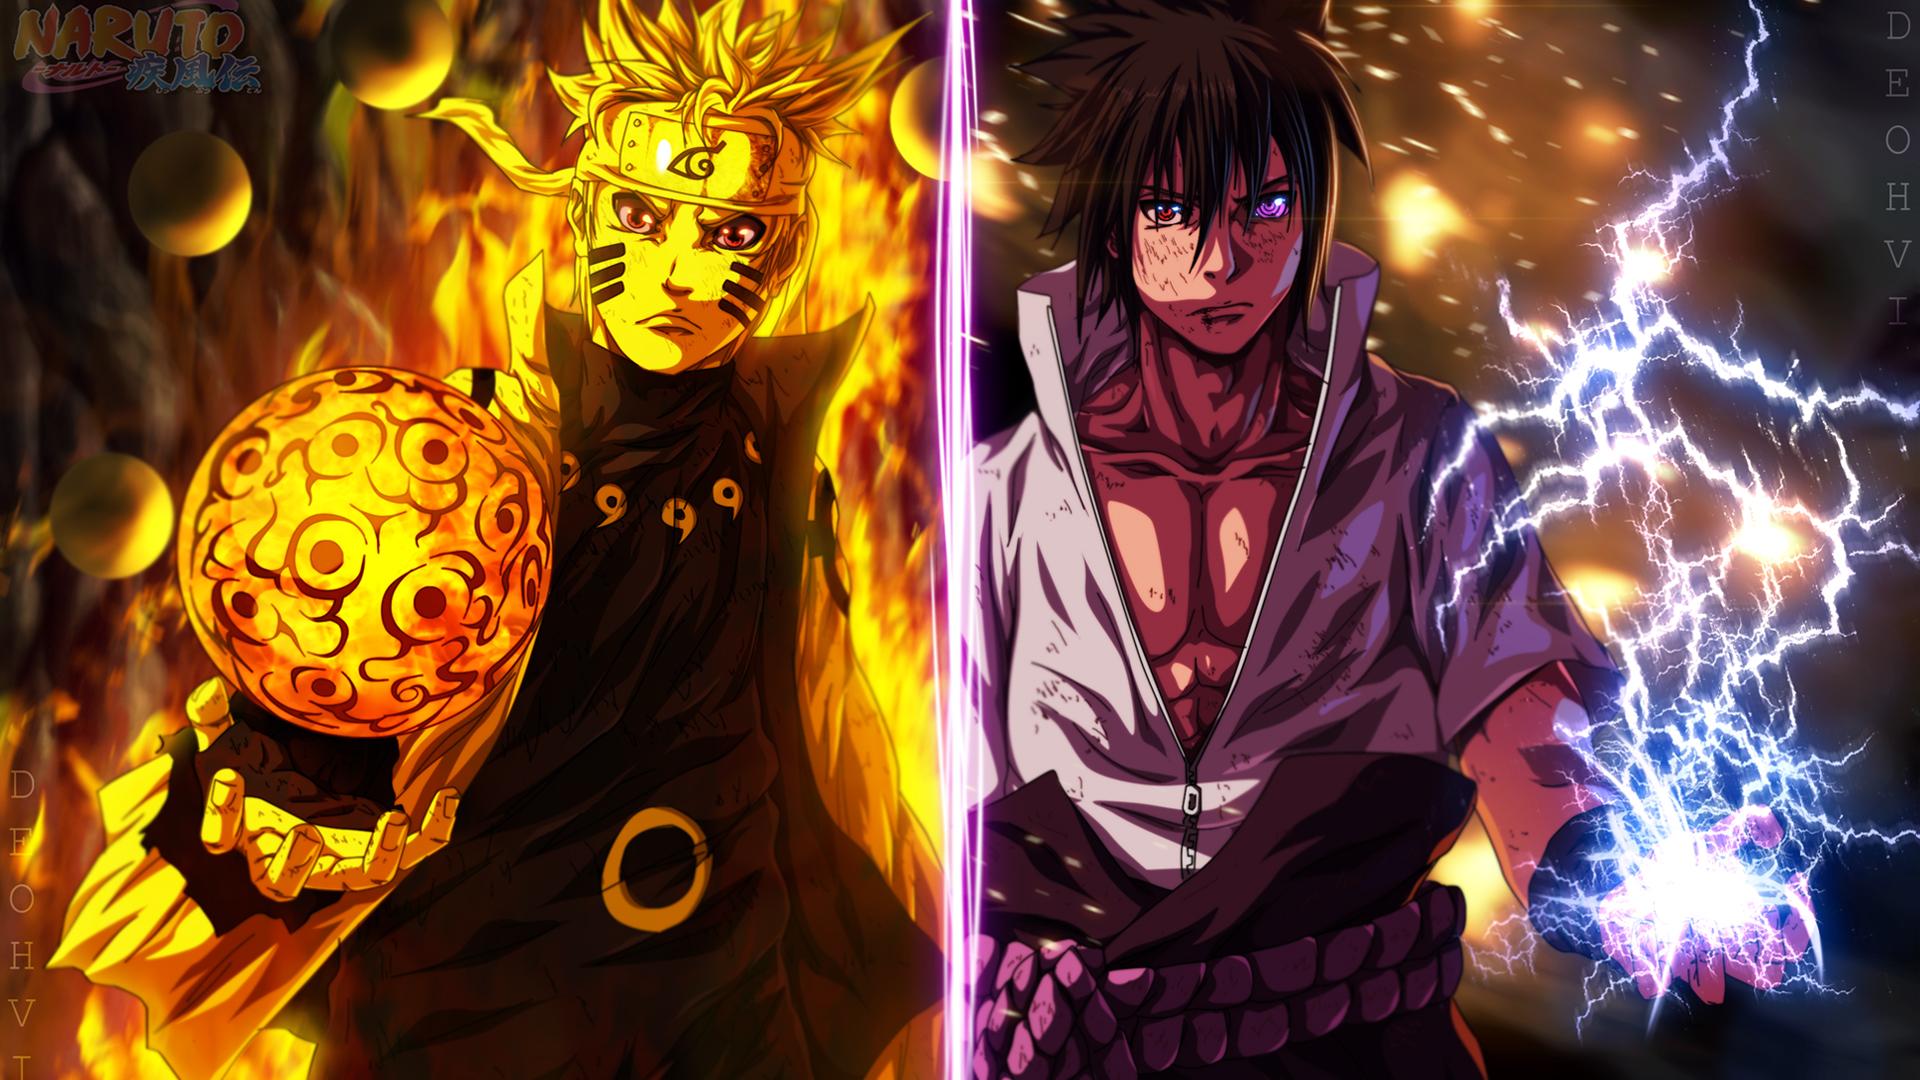 Naruto and Sasuke Wallpaper HD